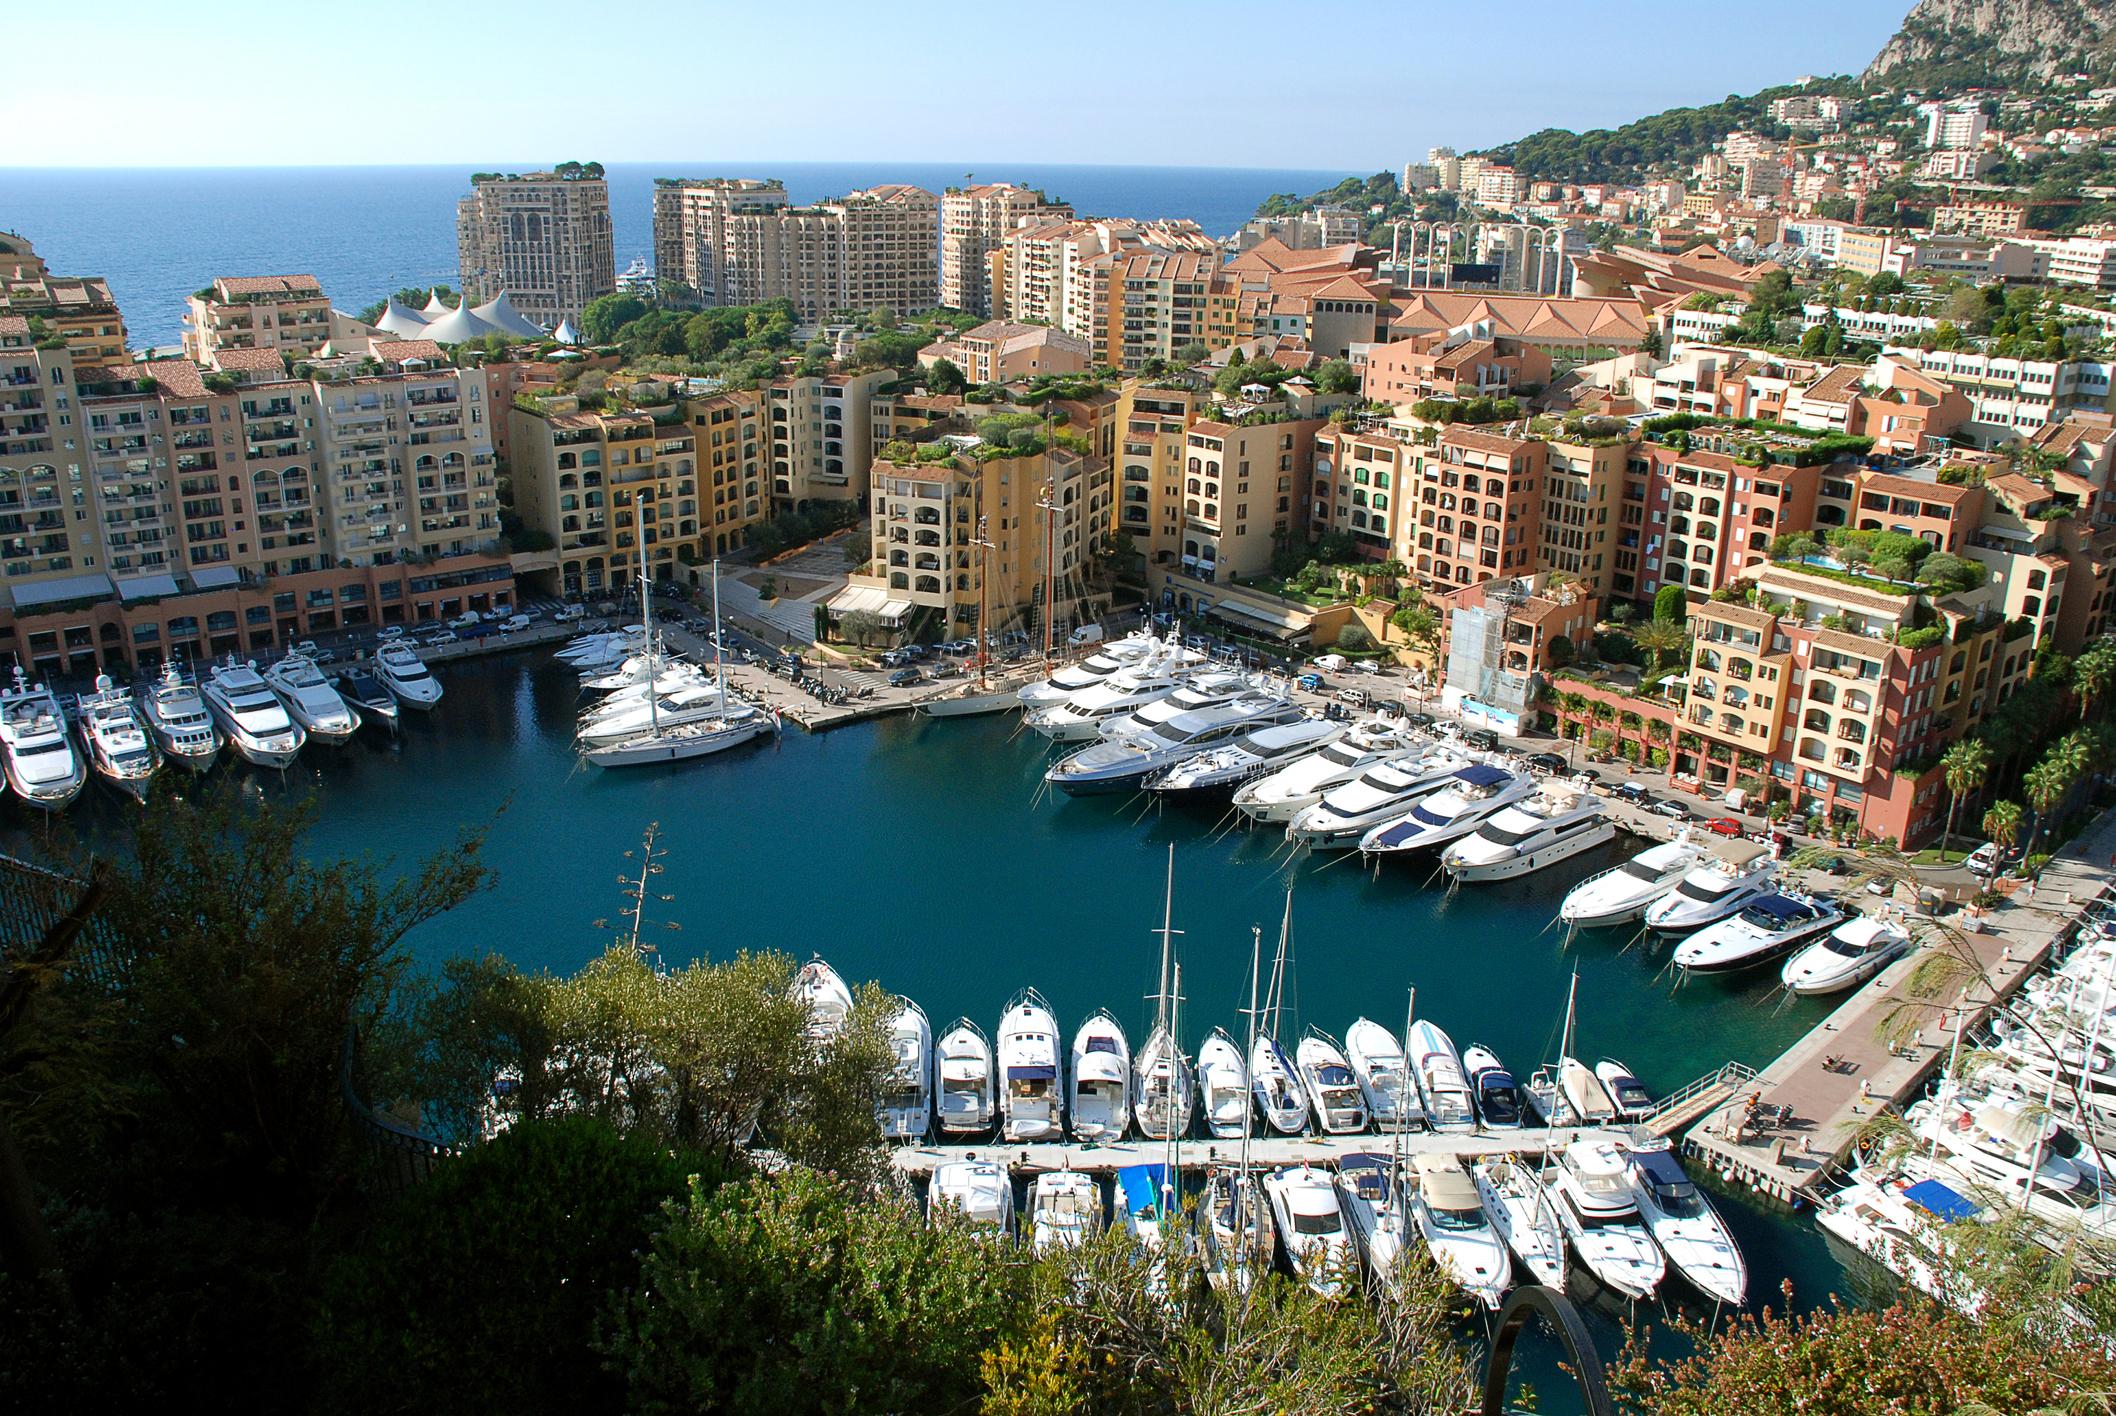 Sotheby's verkauft geschichtsträchtige Villa in Monaco zum Rekordpreis